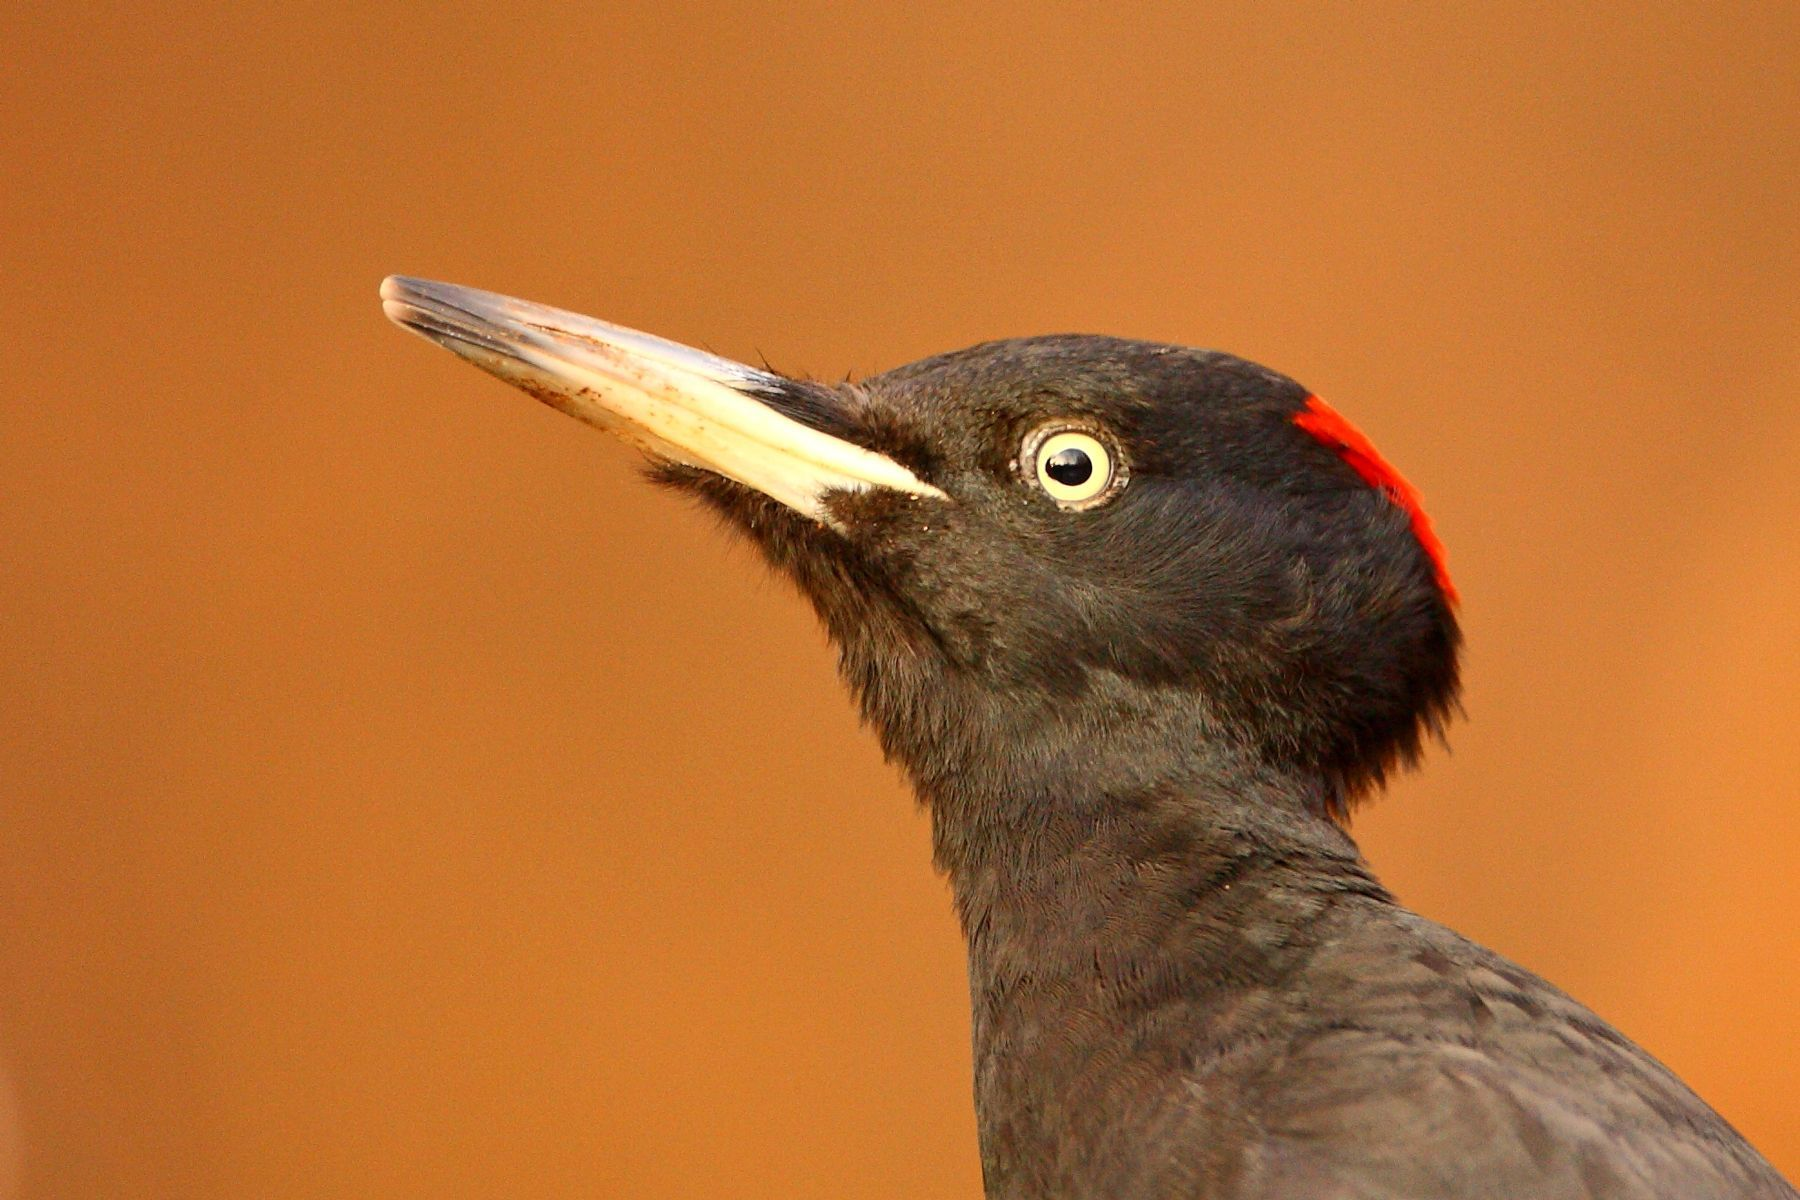 Black Woodpecker portrait from Hungary